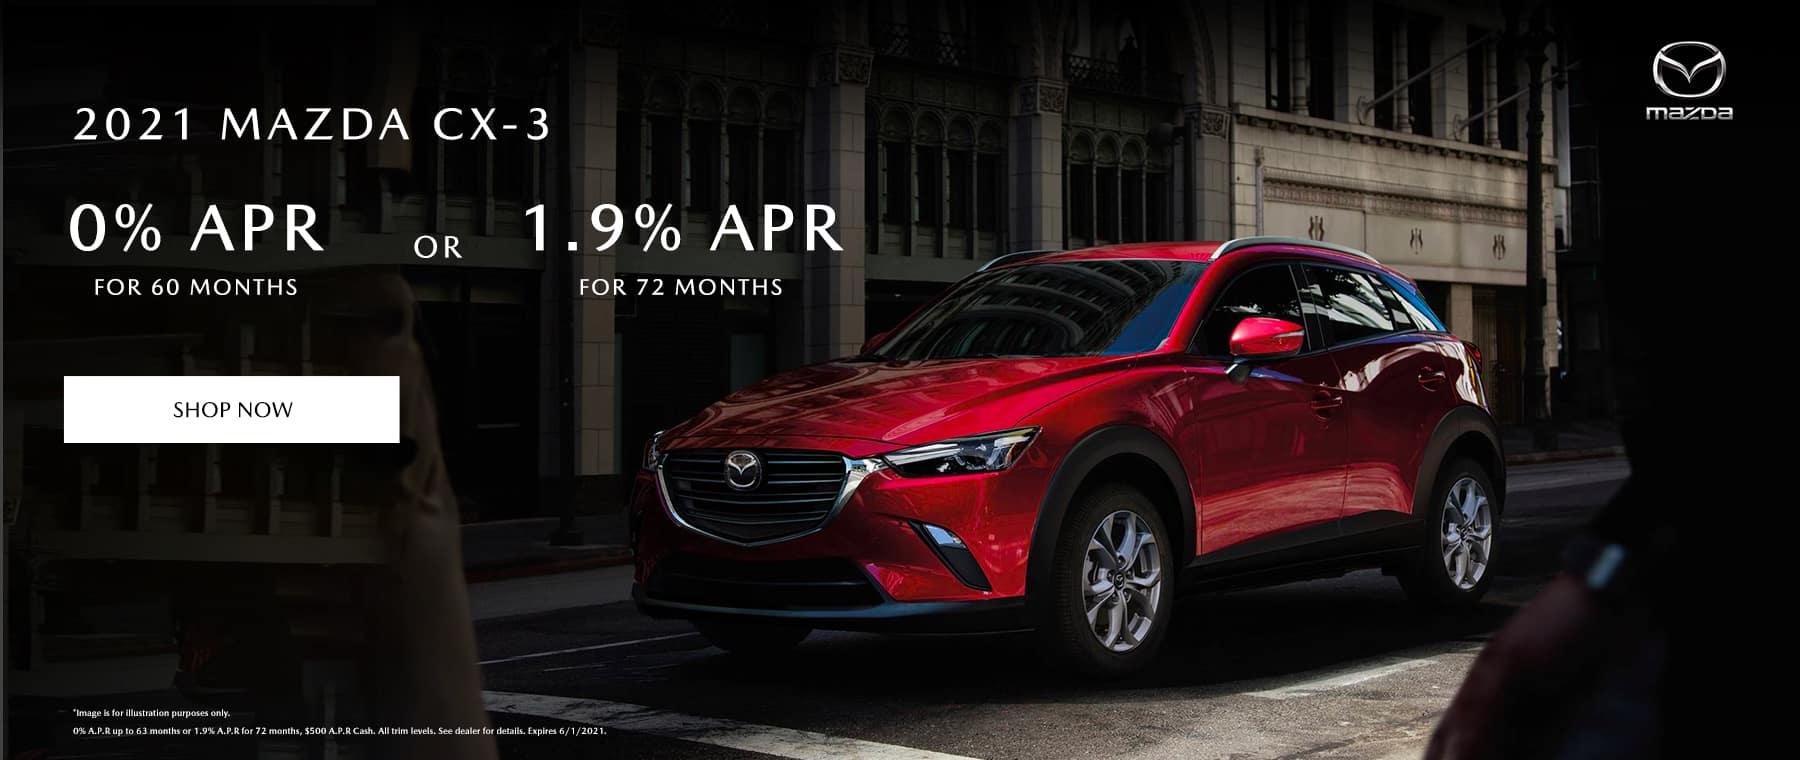 may2021-MazdaCX3-JFSCAG_SL_1800x760_cx3